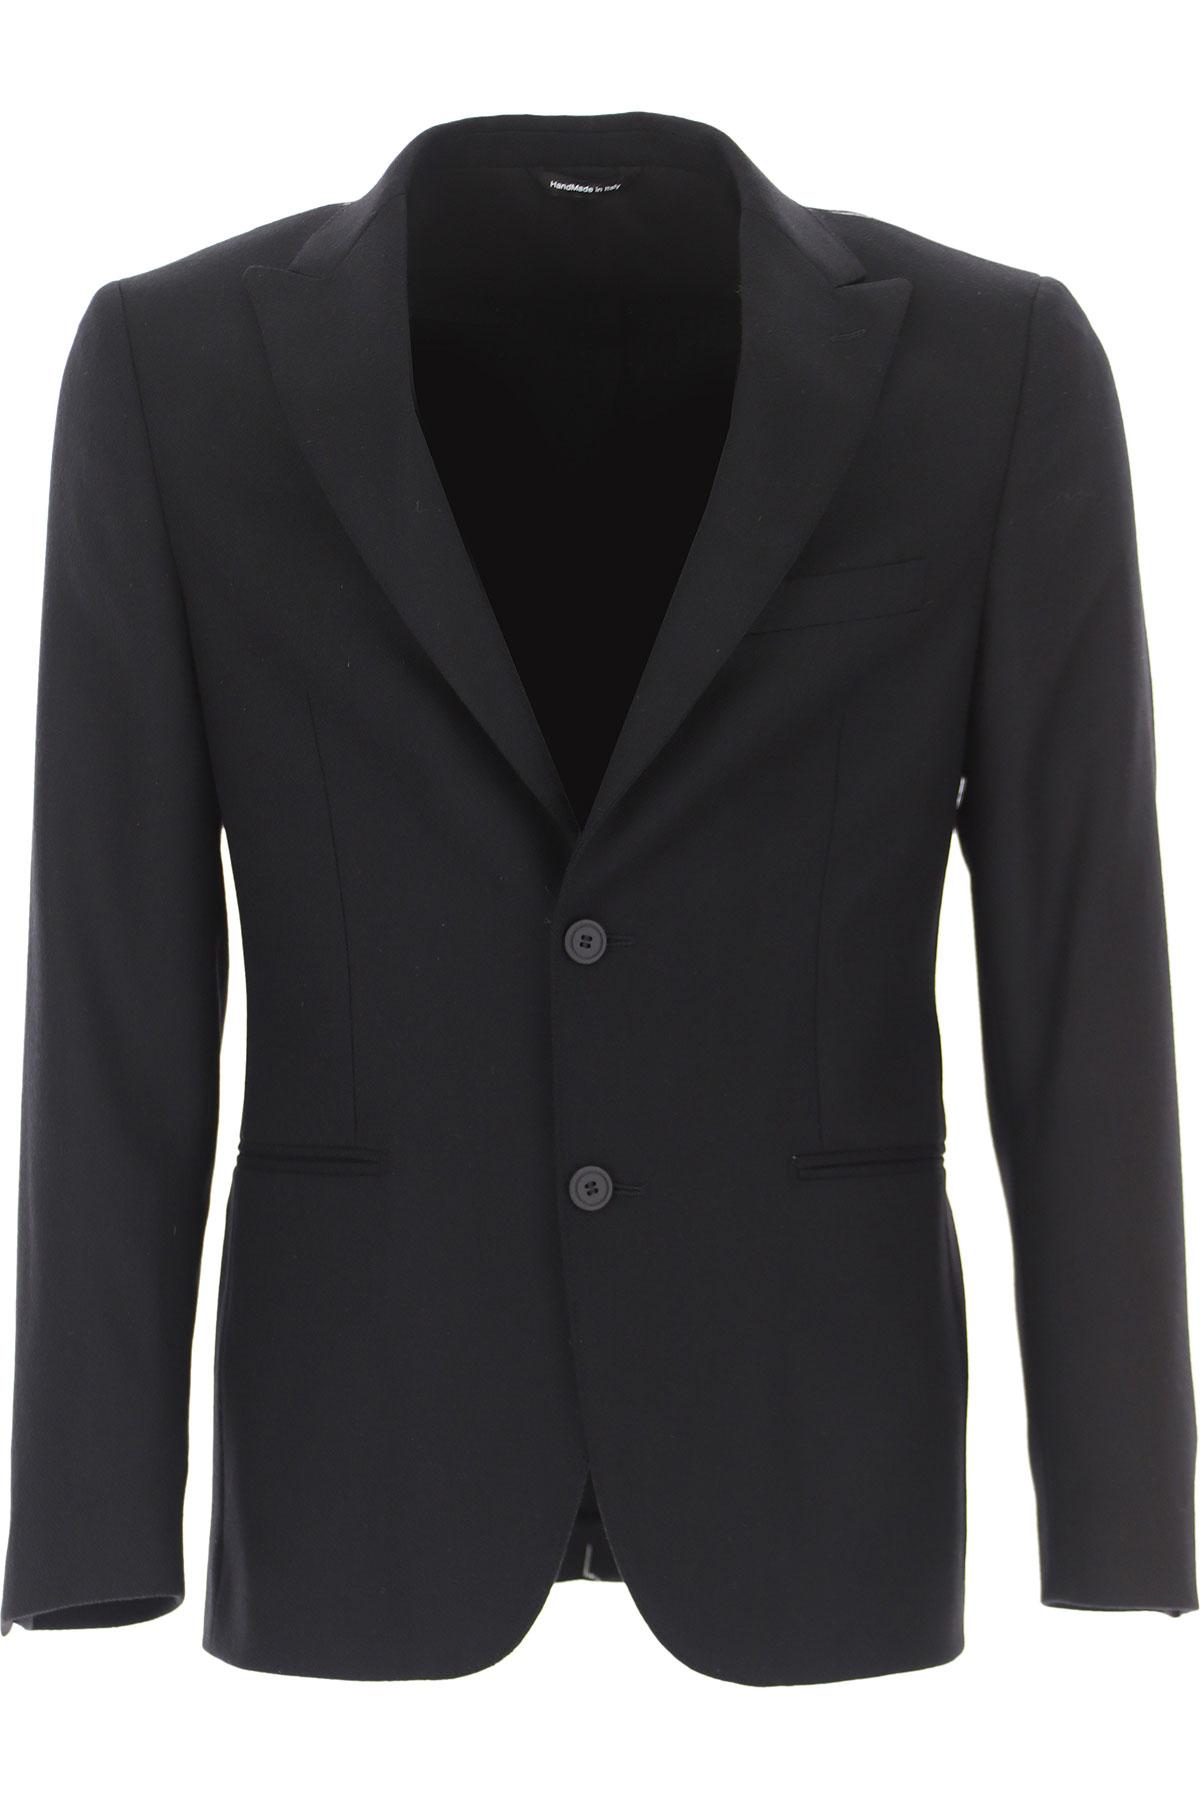 Tonello Blazer for Men, Sport Coat On Sale, Black, Cashemere, 2019, L S